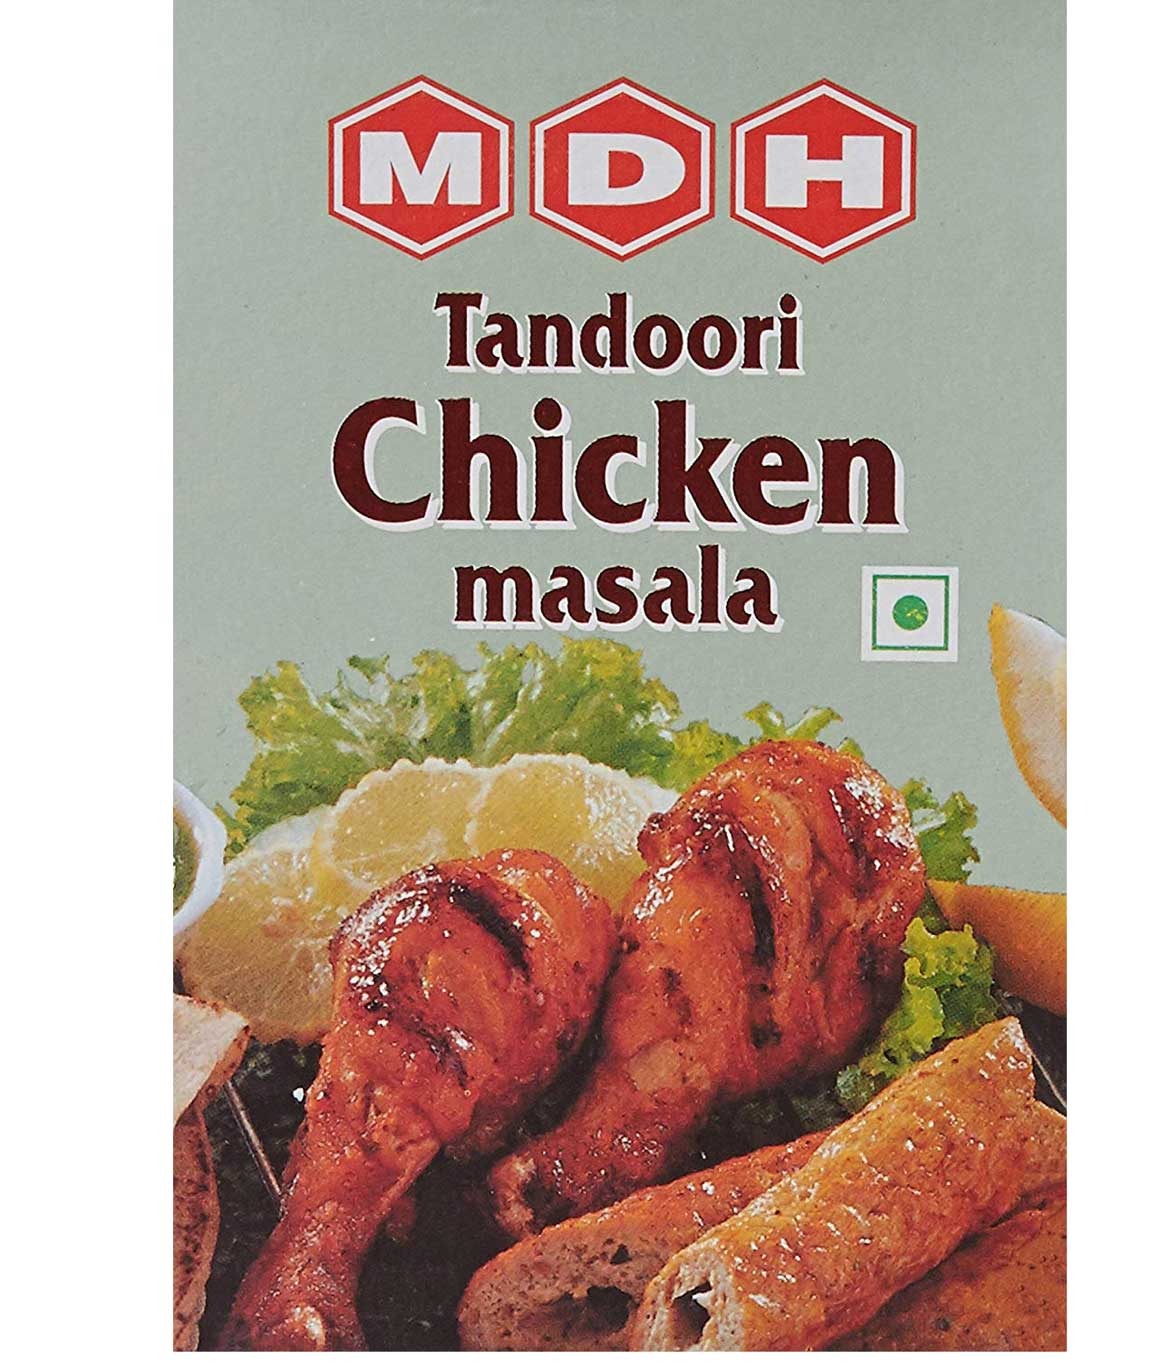 MDH Tandoori Chicken, 100g